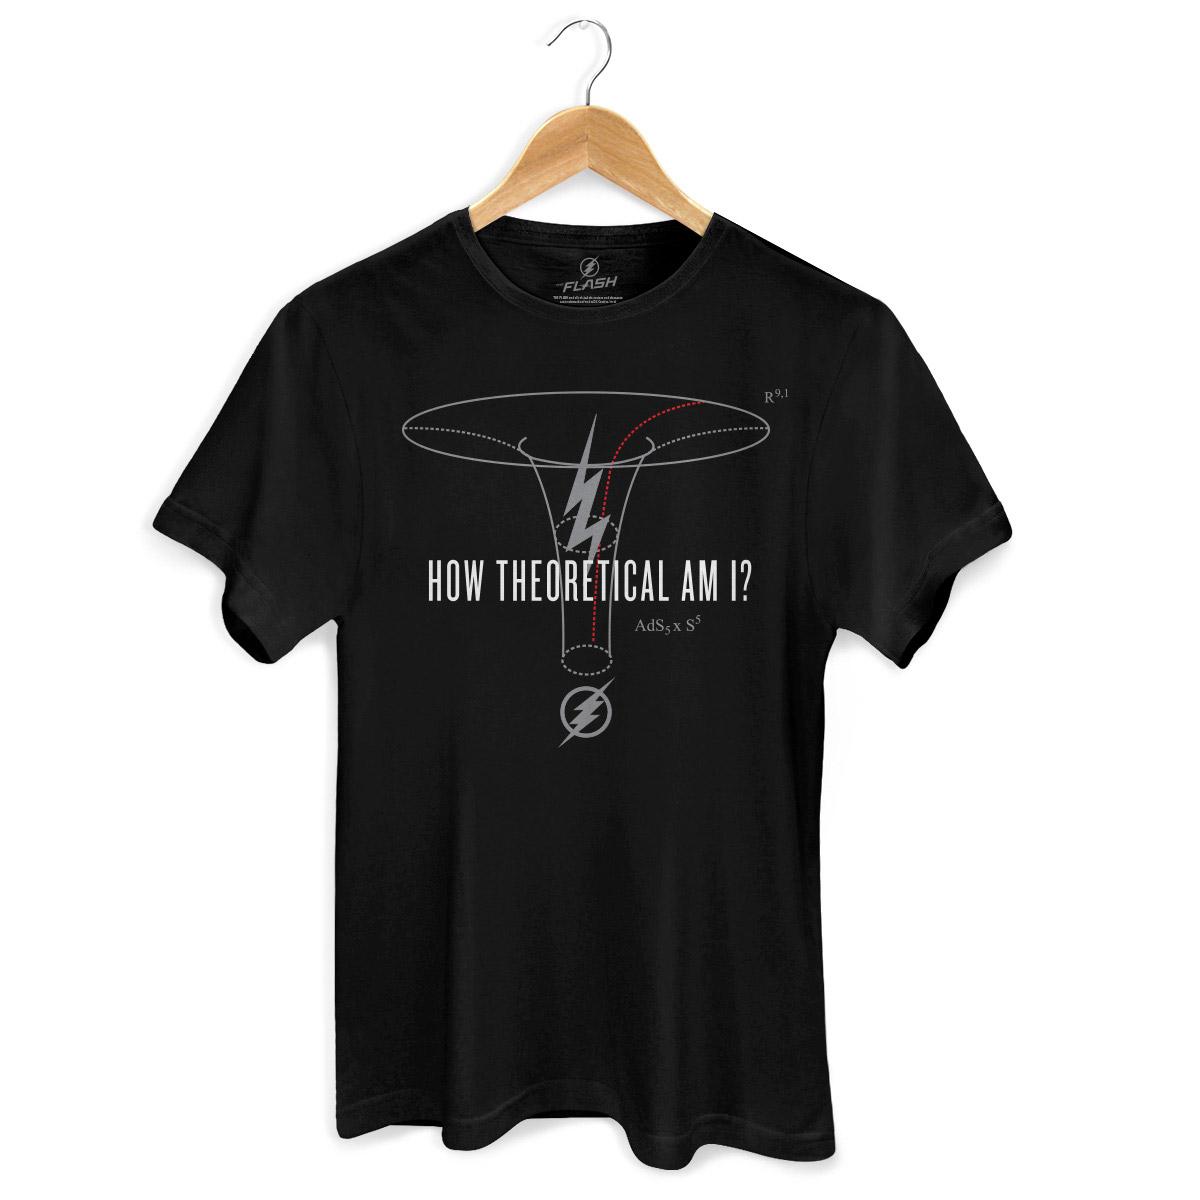 Camiseta Masculina The Flash Serie How Theoretical Am I?